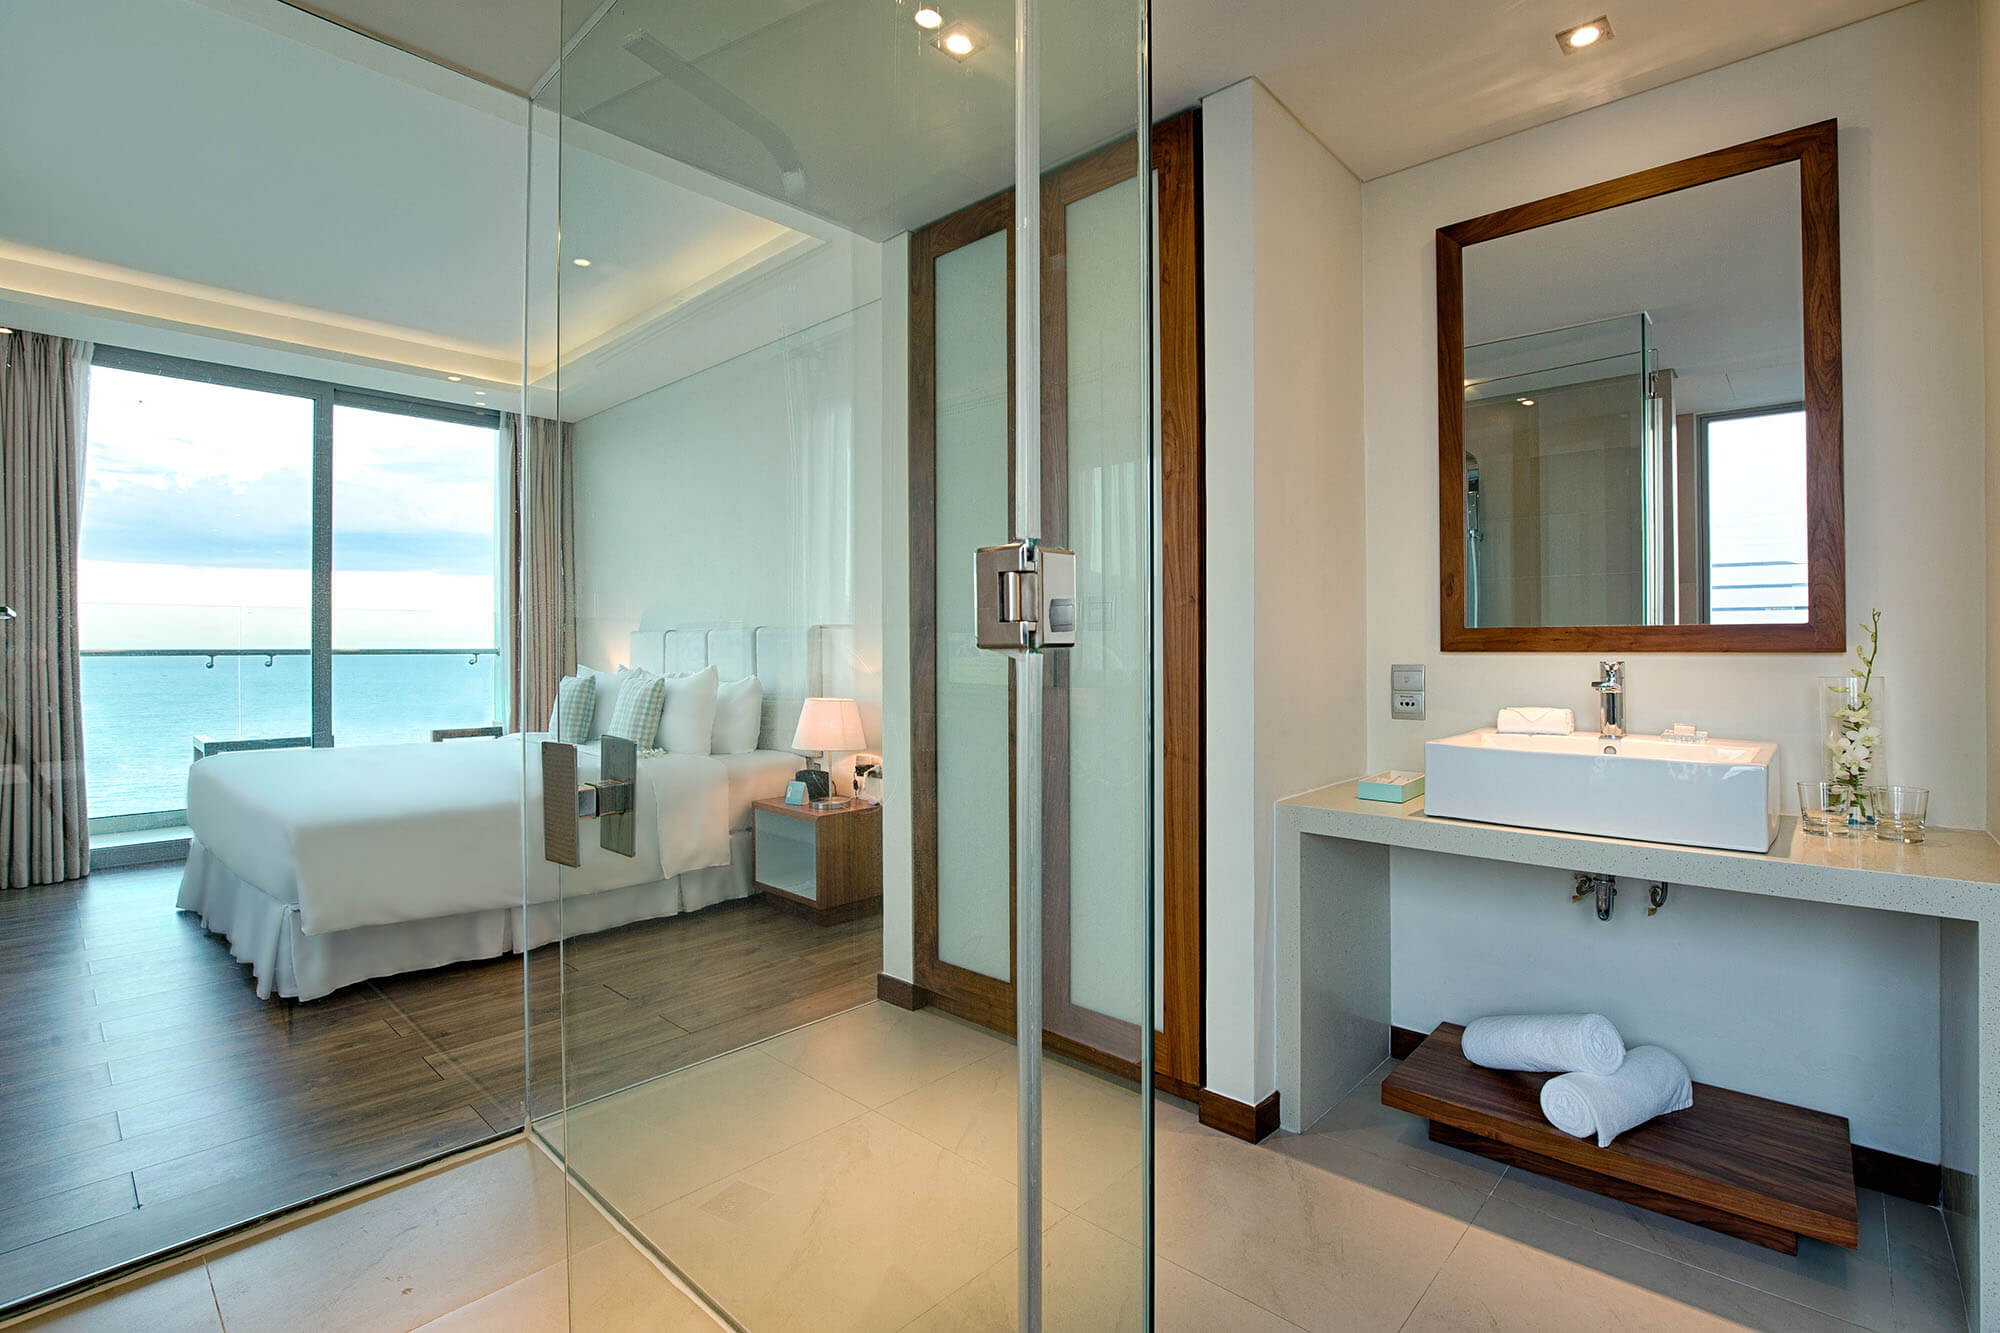 Delight Ocean View Apartment A La Carte Danang Beach Hotel 200 Vo Nguyen Giap Danang Fantasticity Com 02